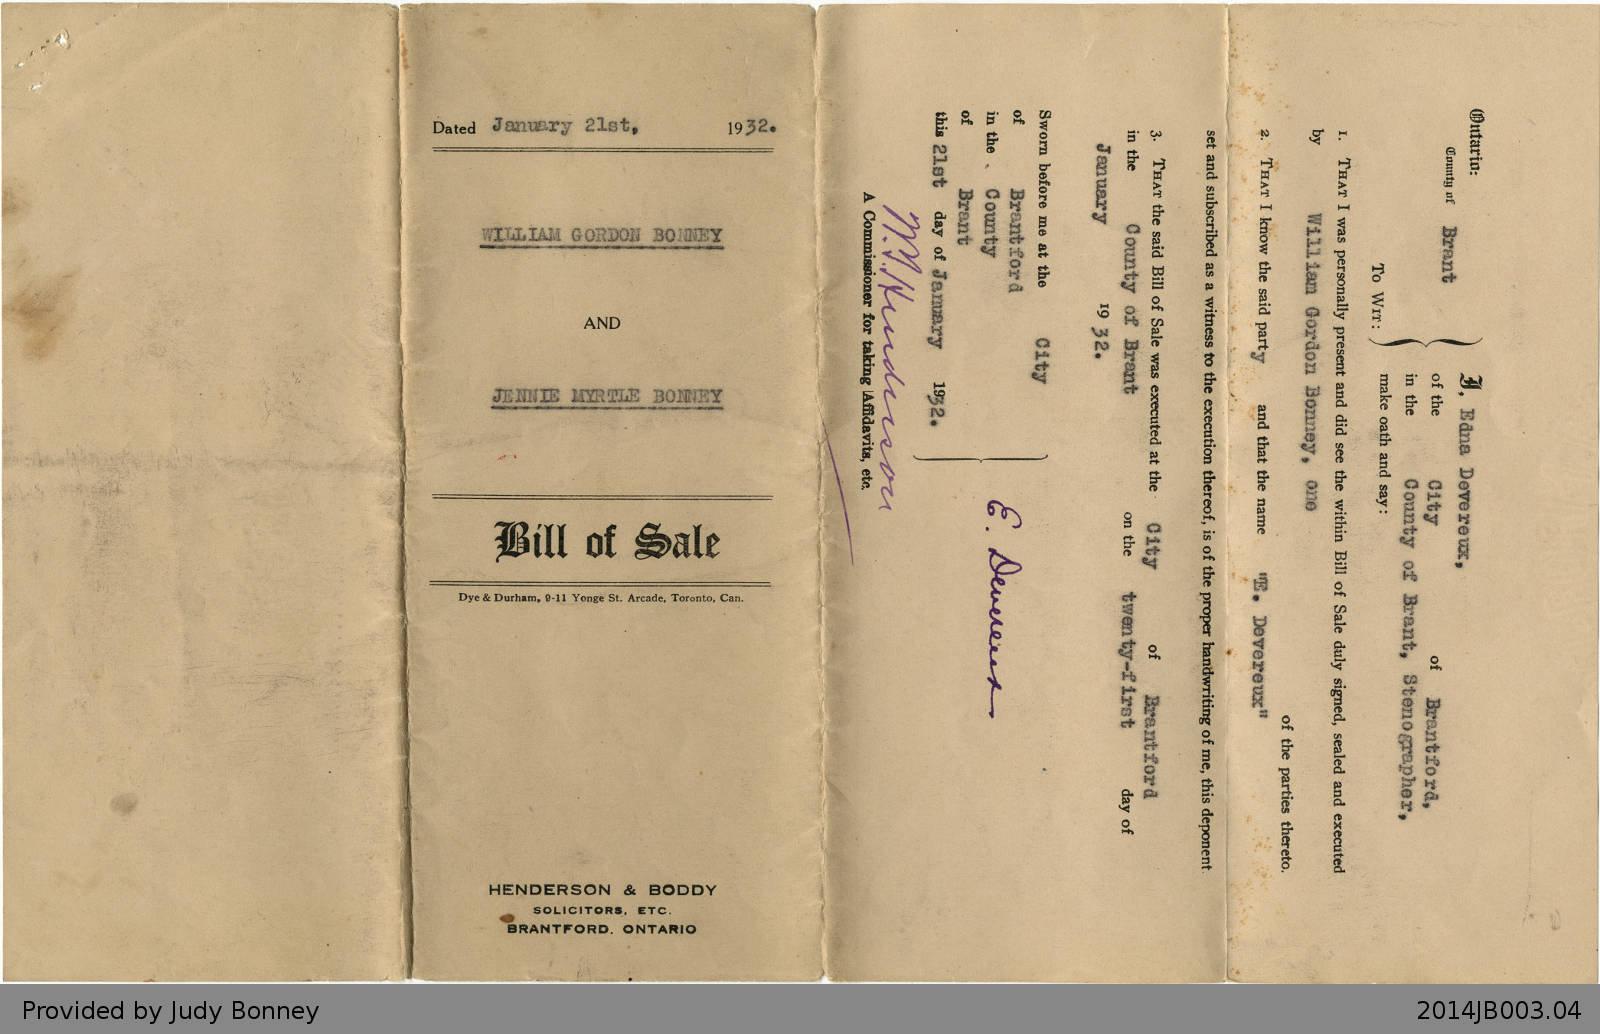 Bill of Sale Between William Gordon Bonney and Jennie Myrtle Bonney